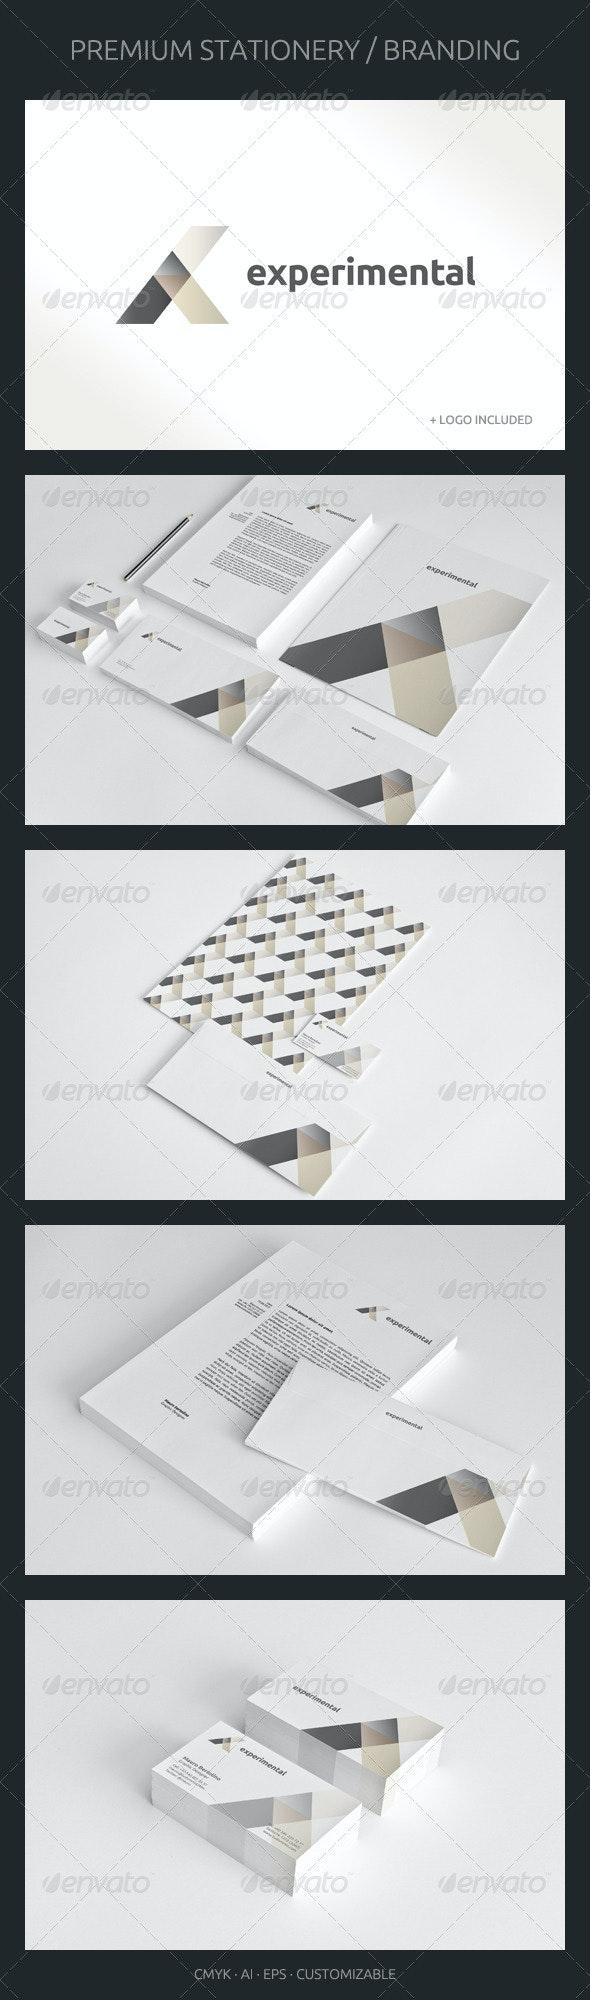 Experimental - Corporate Identity - Stationery Print Templates